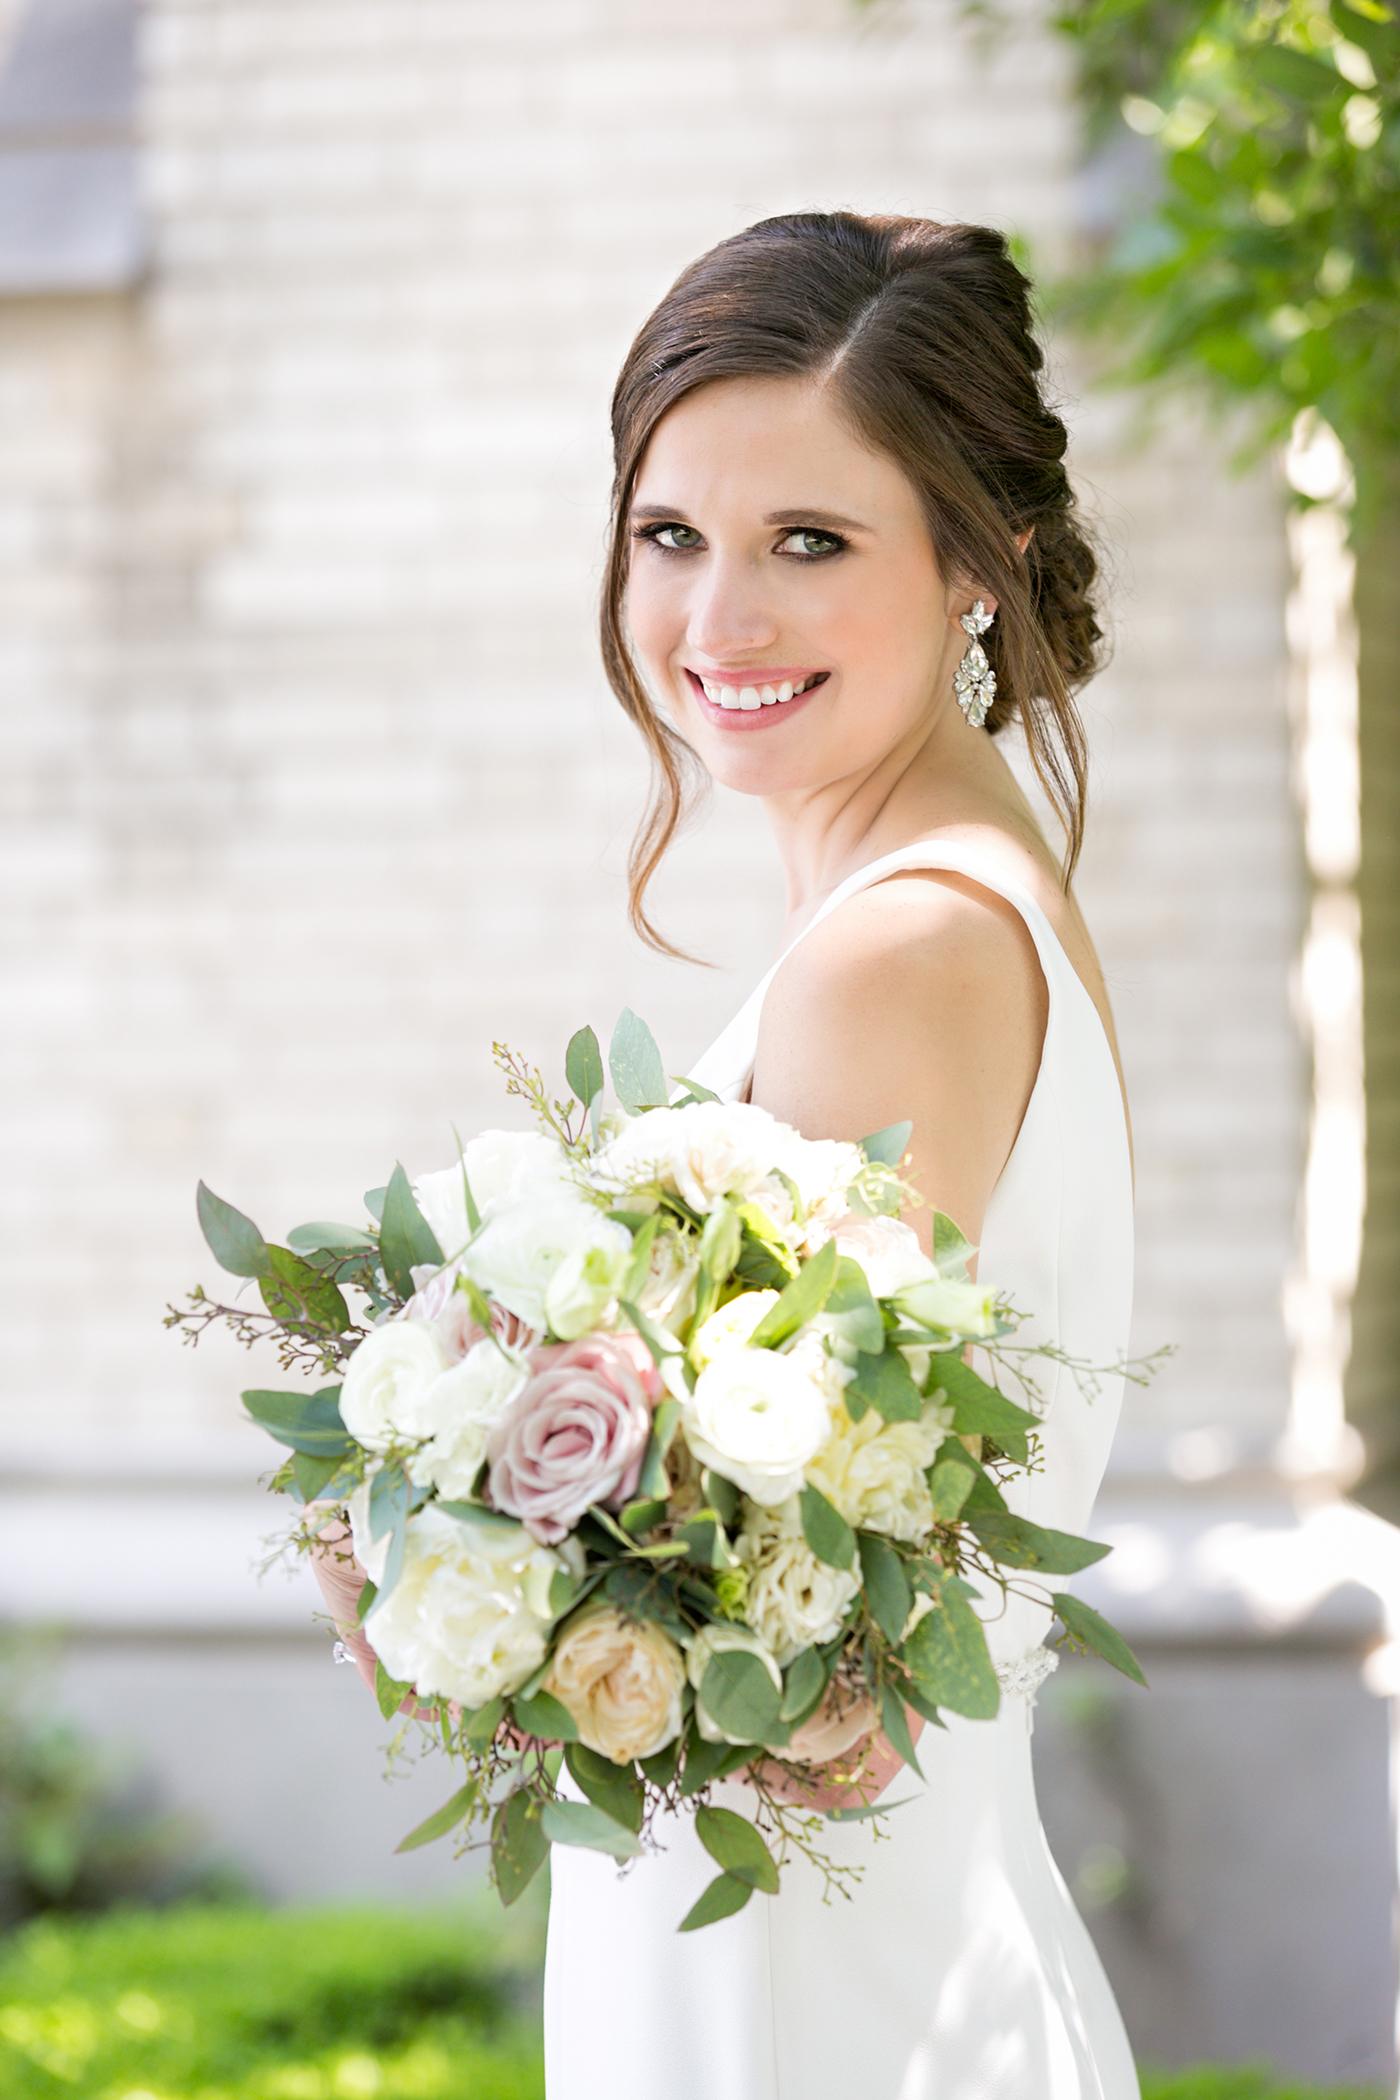 Wedding Planner Dallas TX - Allday Events - Highland Park - Marie Gabrielle Wedding - 195.jpg